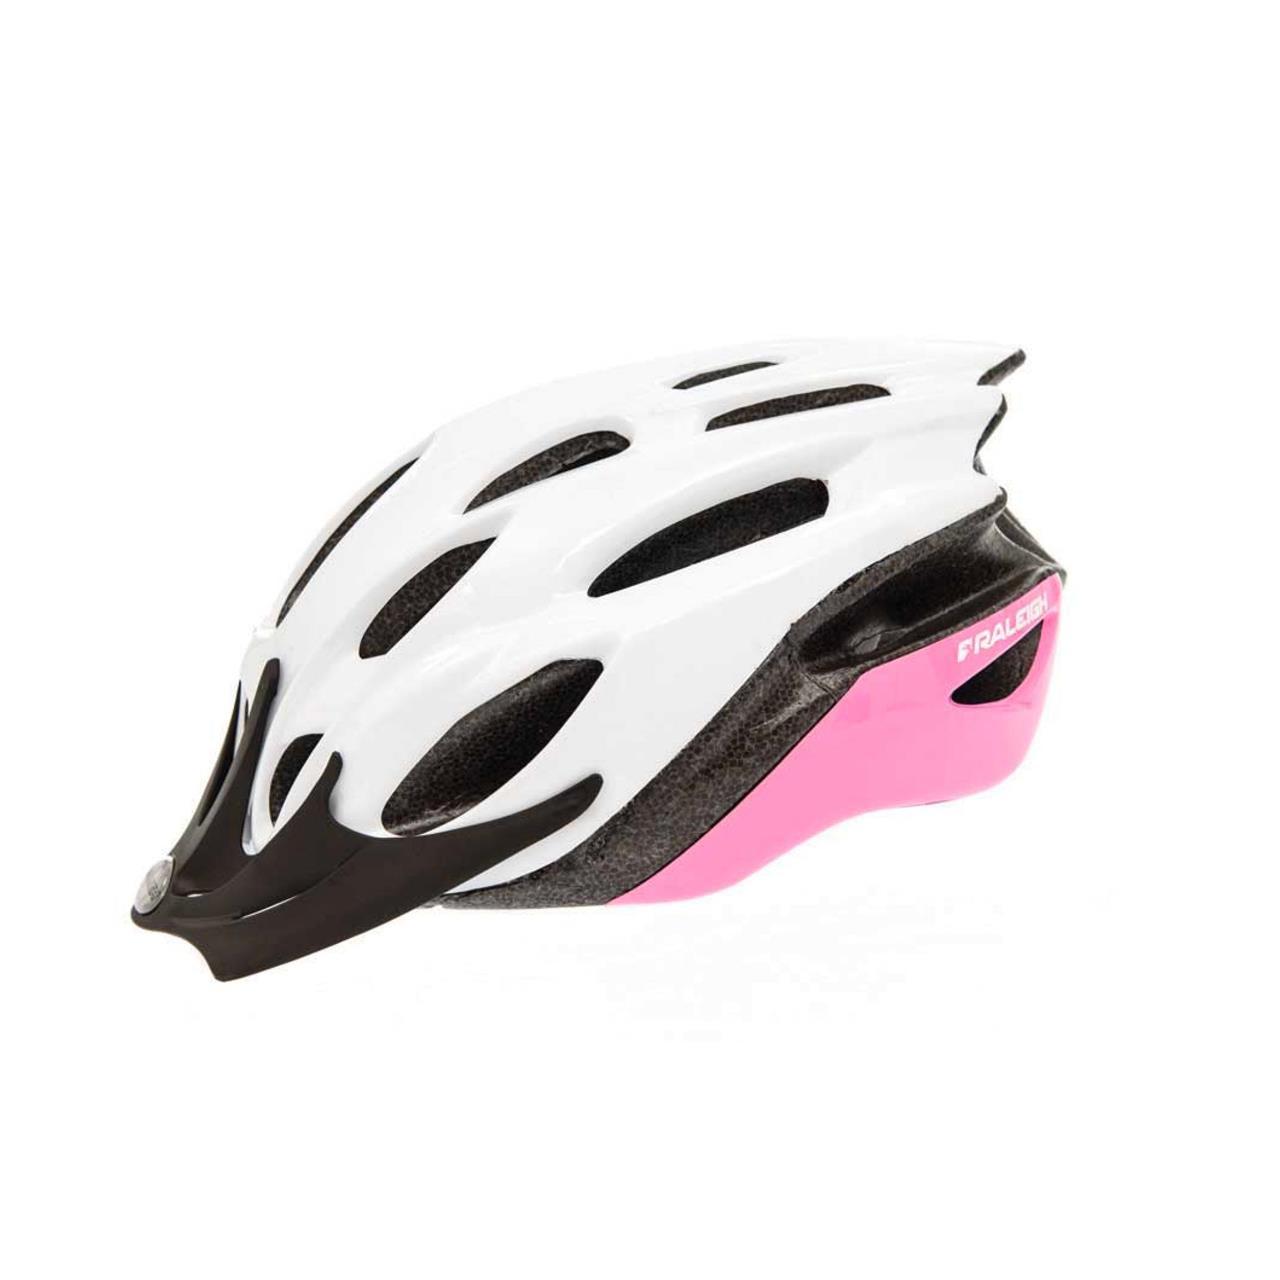 Raleigh Mission EVO Cycle Helmet (Pink/White - Medium, 54-58cm)